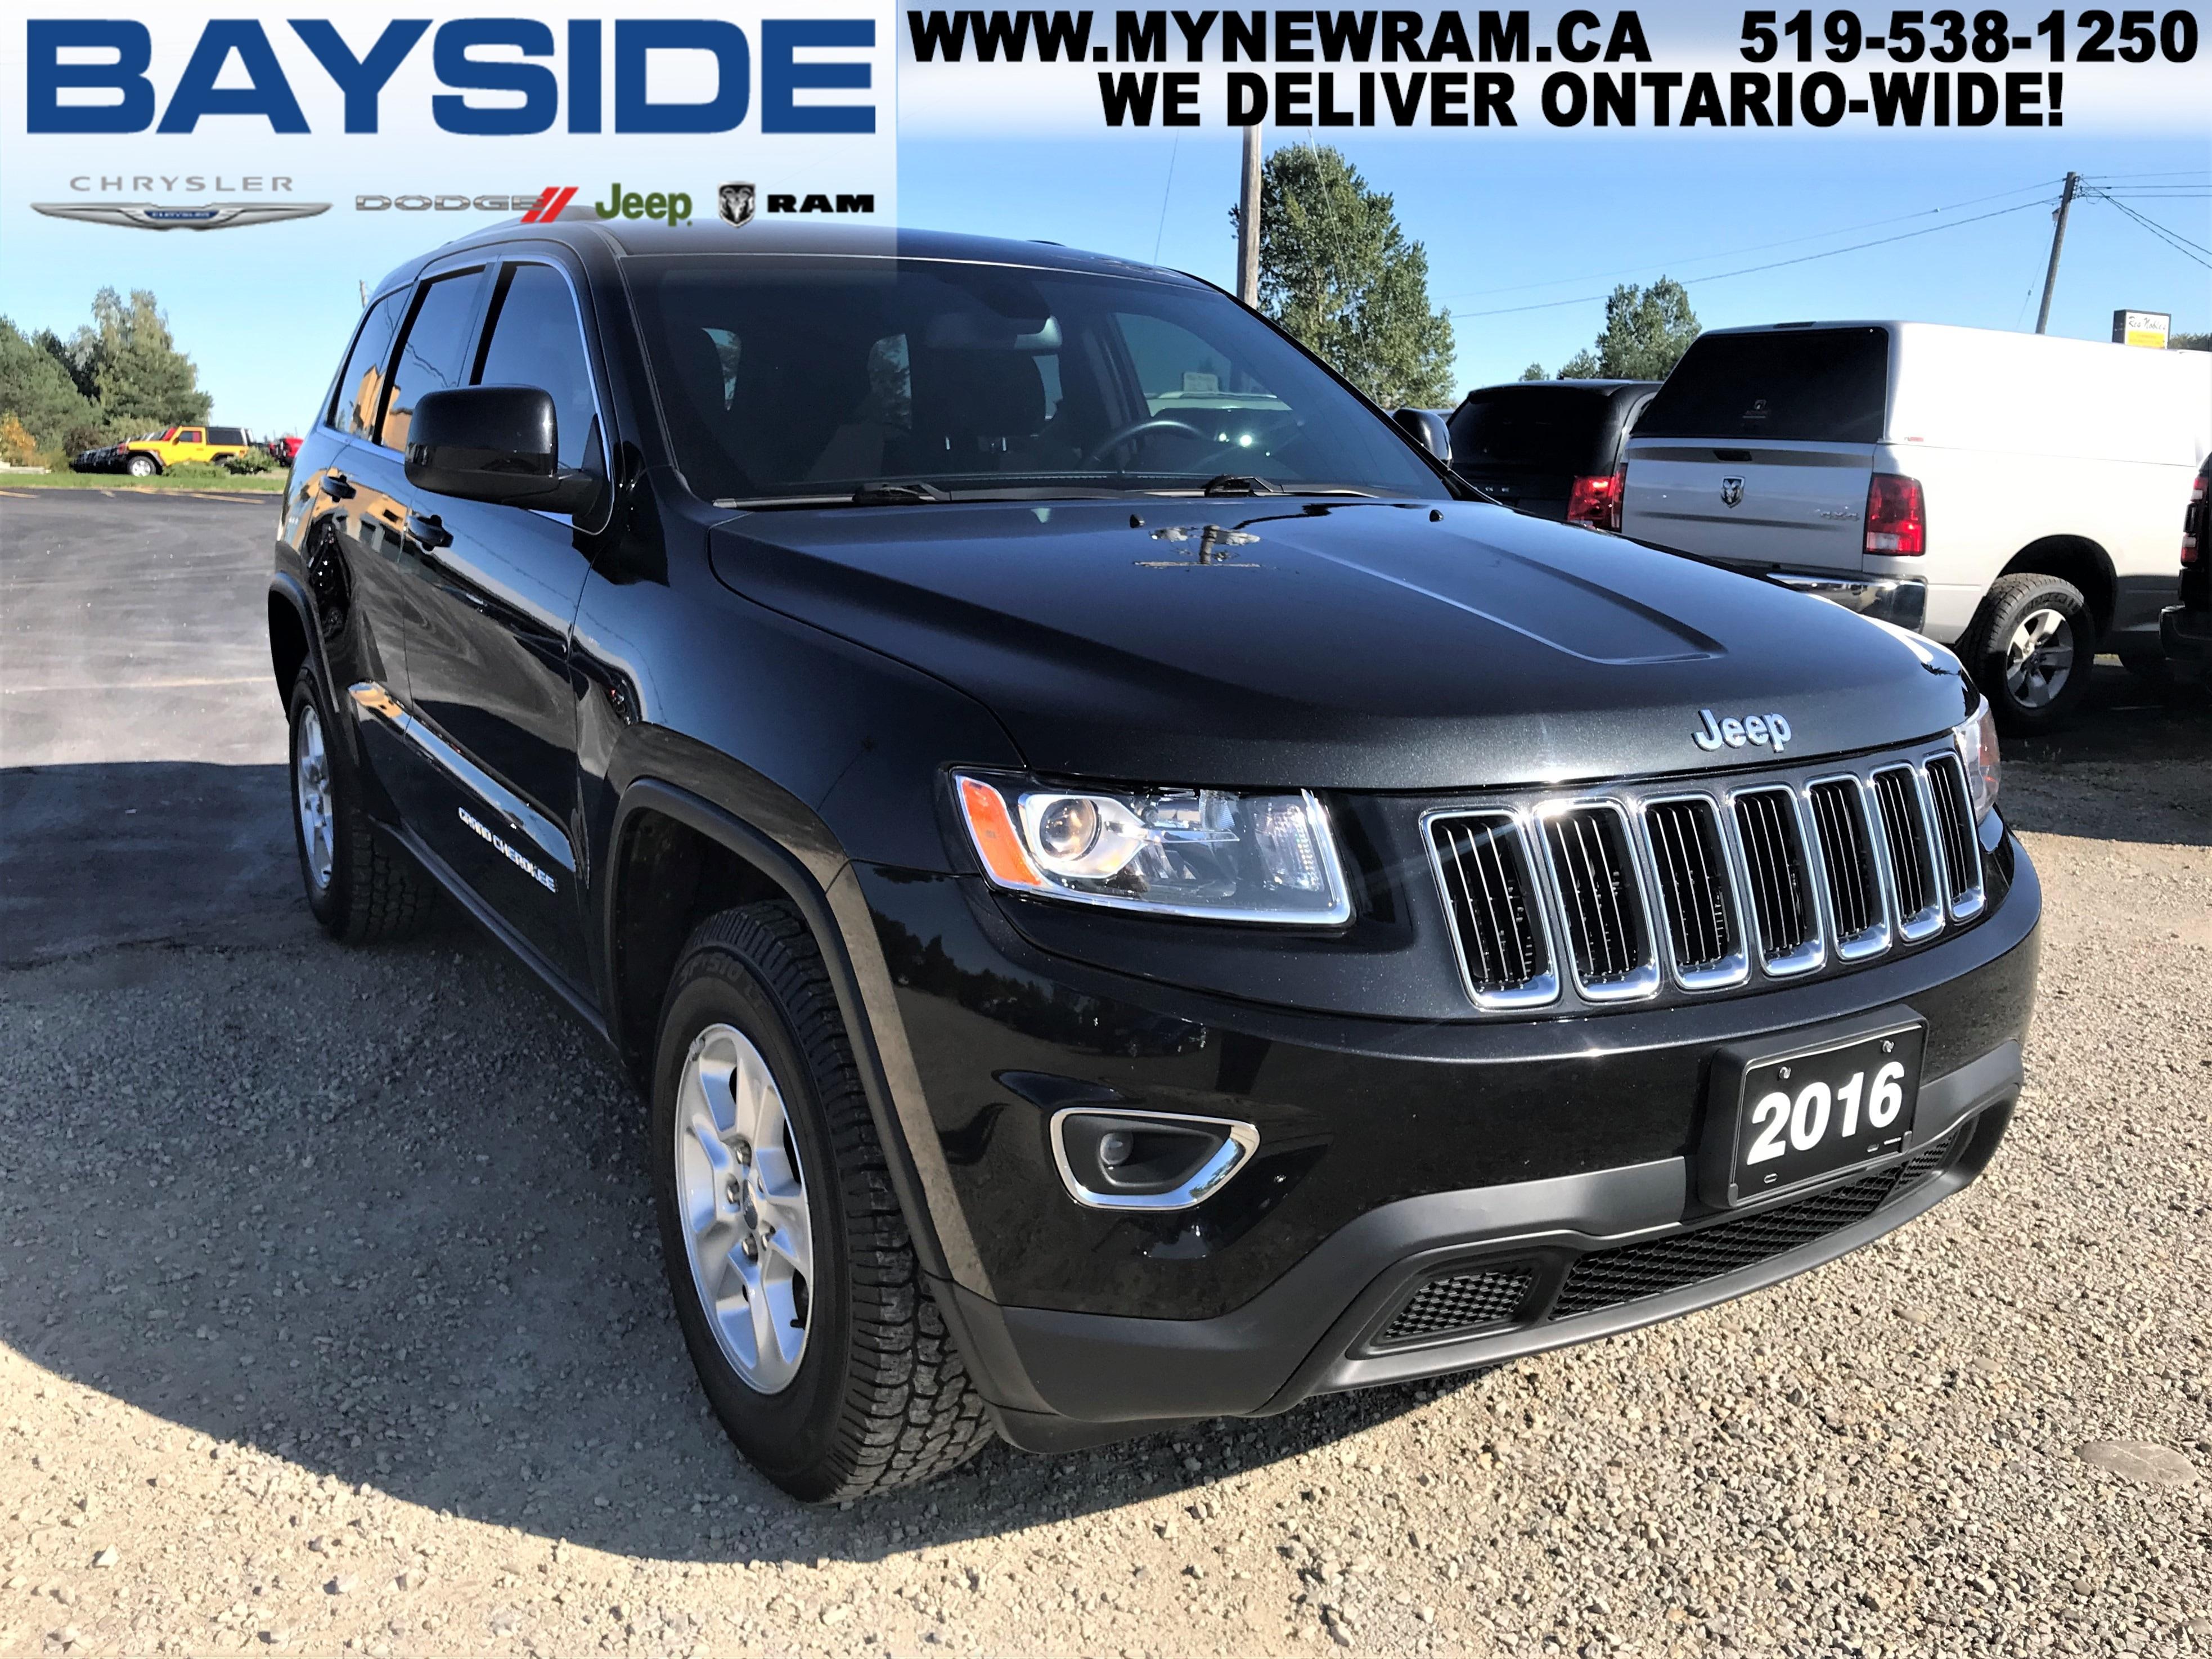 2016 Jeep Grand Cherokee Laredo | 4x4 SUV